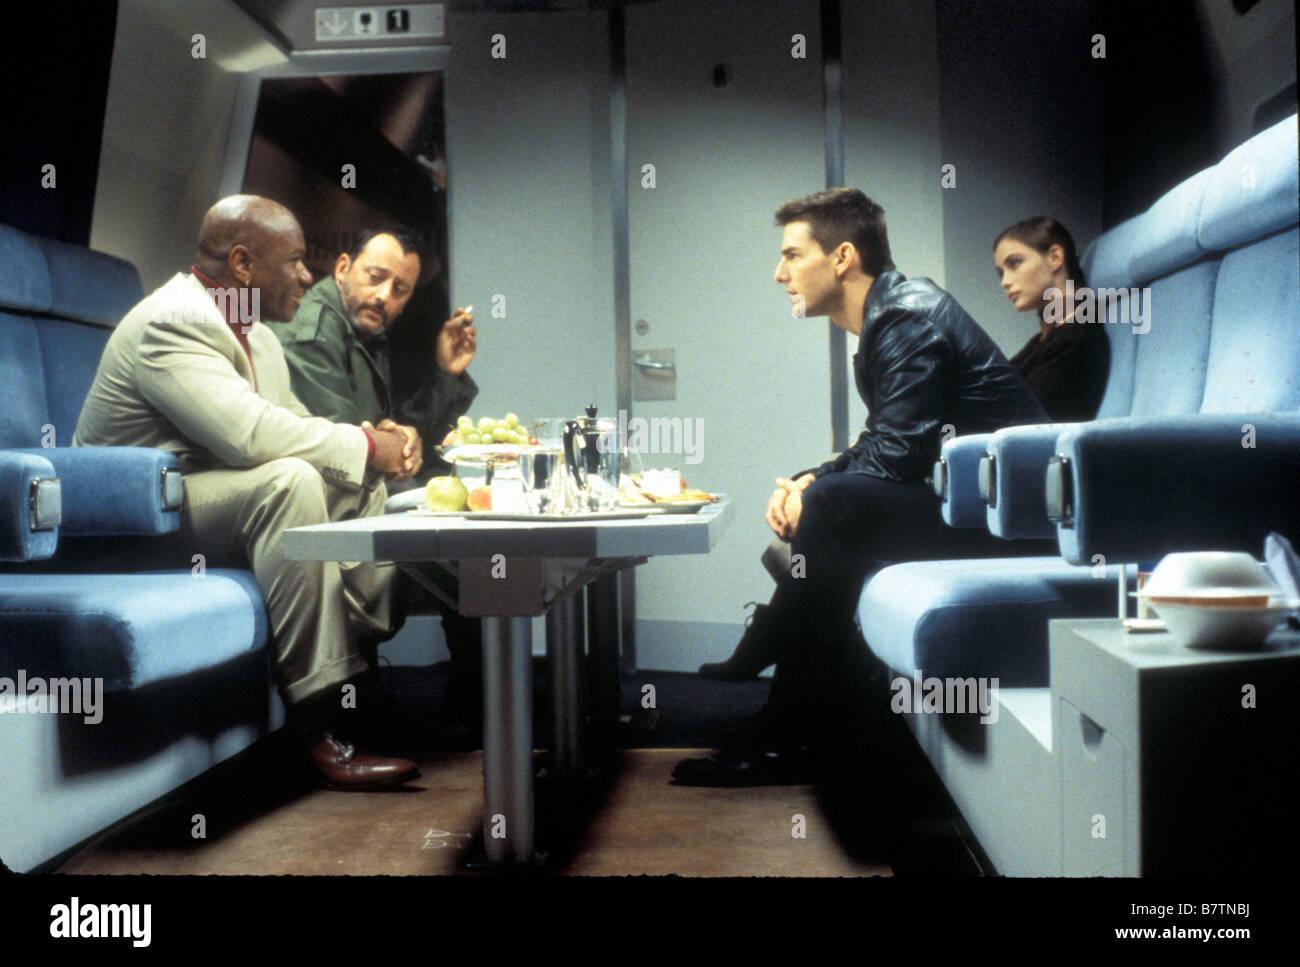 Mission: Impossible Jahr: 1996 USA Tom Cruise, Emmanuelle Béart, Jean Reno, Ving Rhames Regie: Brian De Palma Stockbild